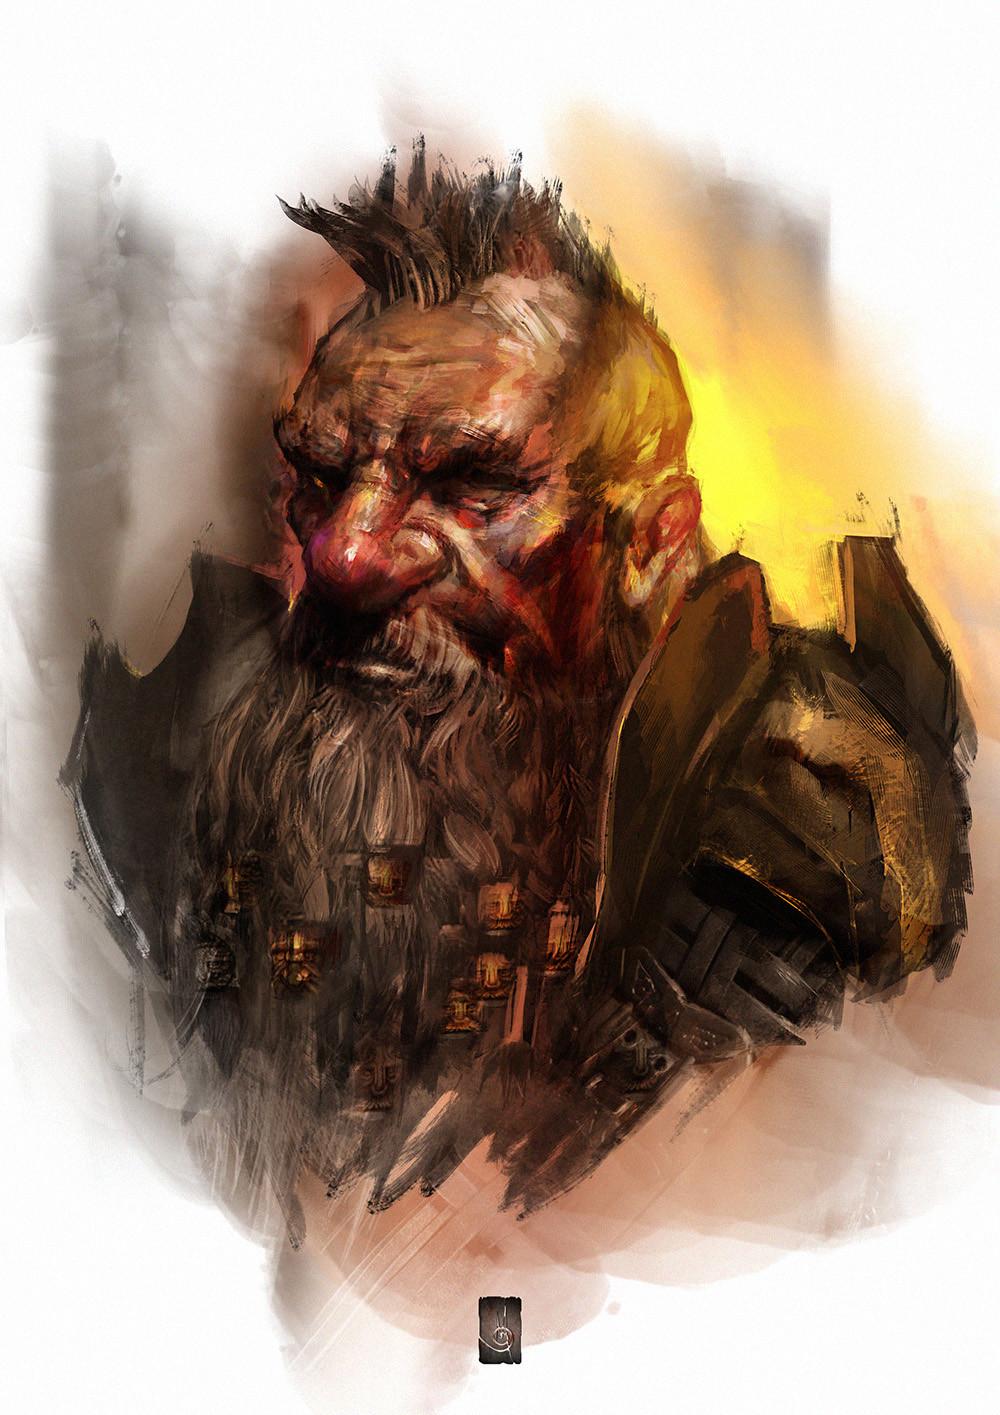 Murat gul dwarf by muratgul